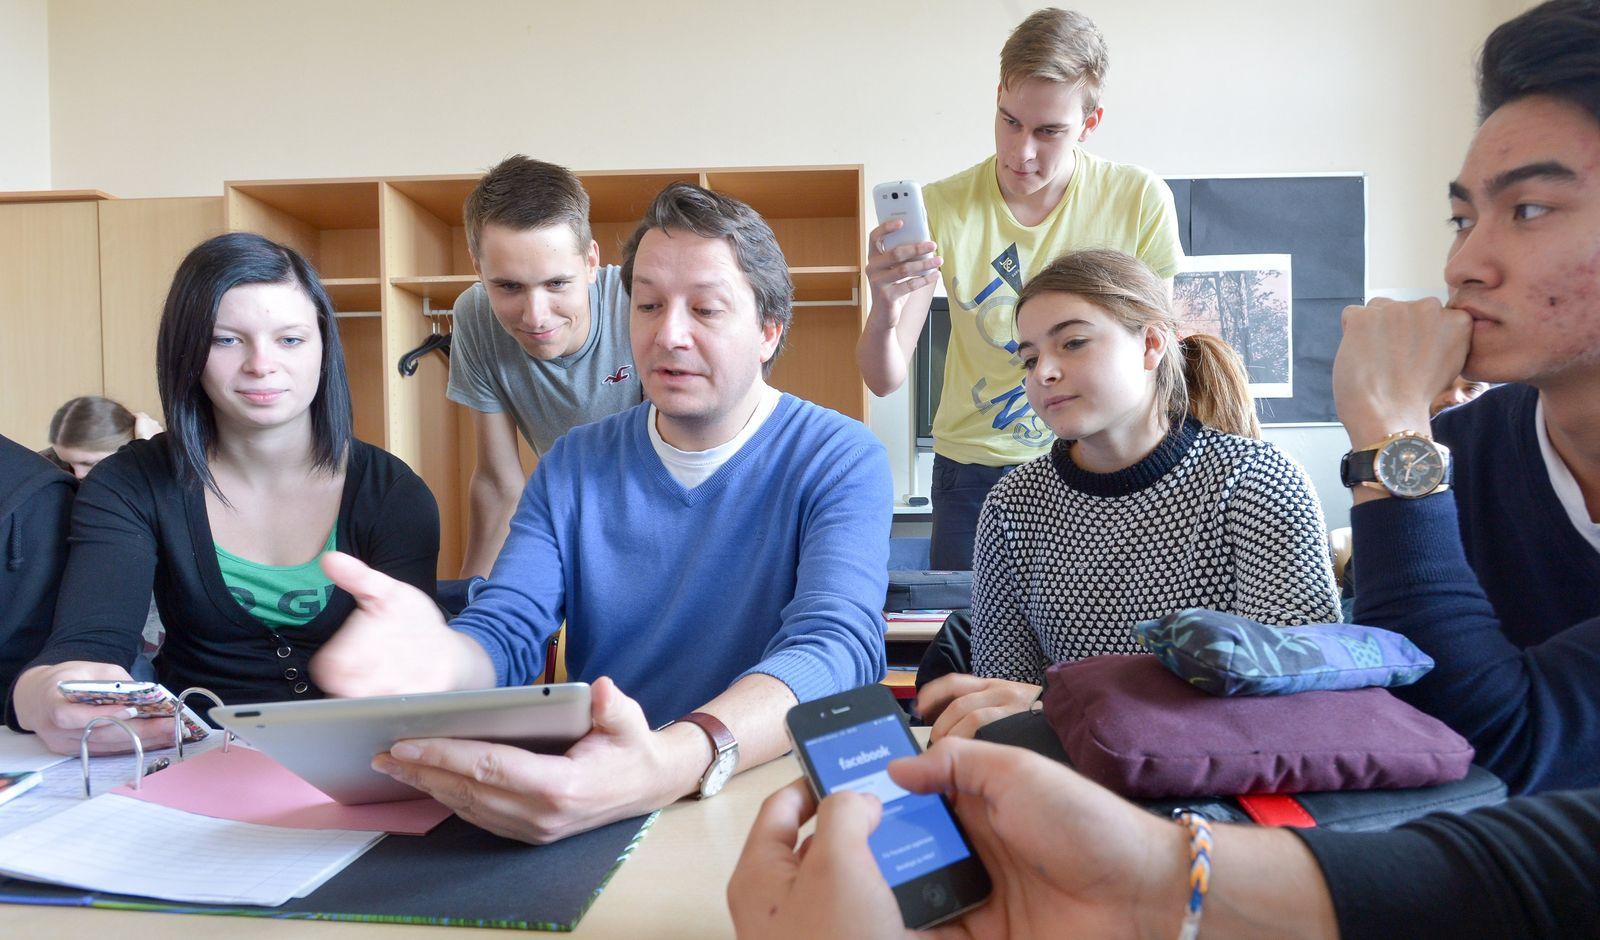 Social Media in der Schule